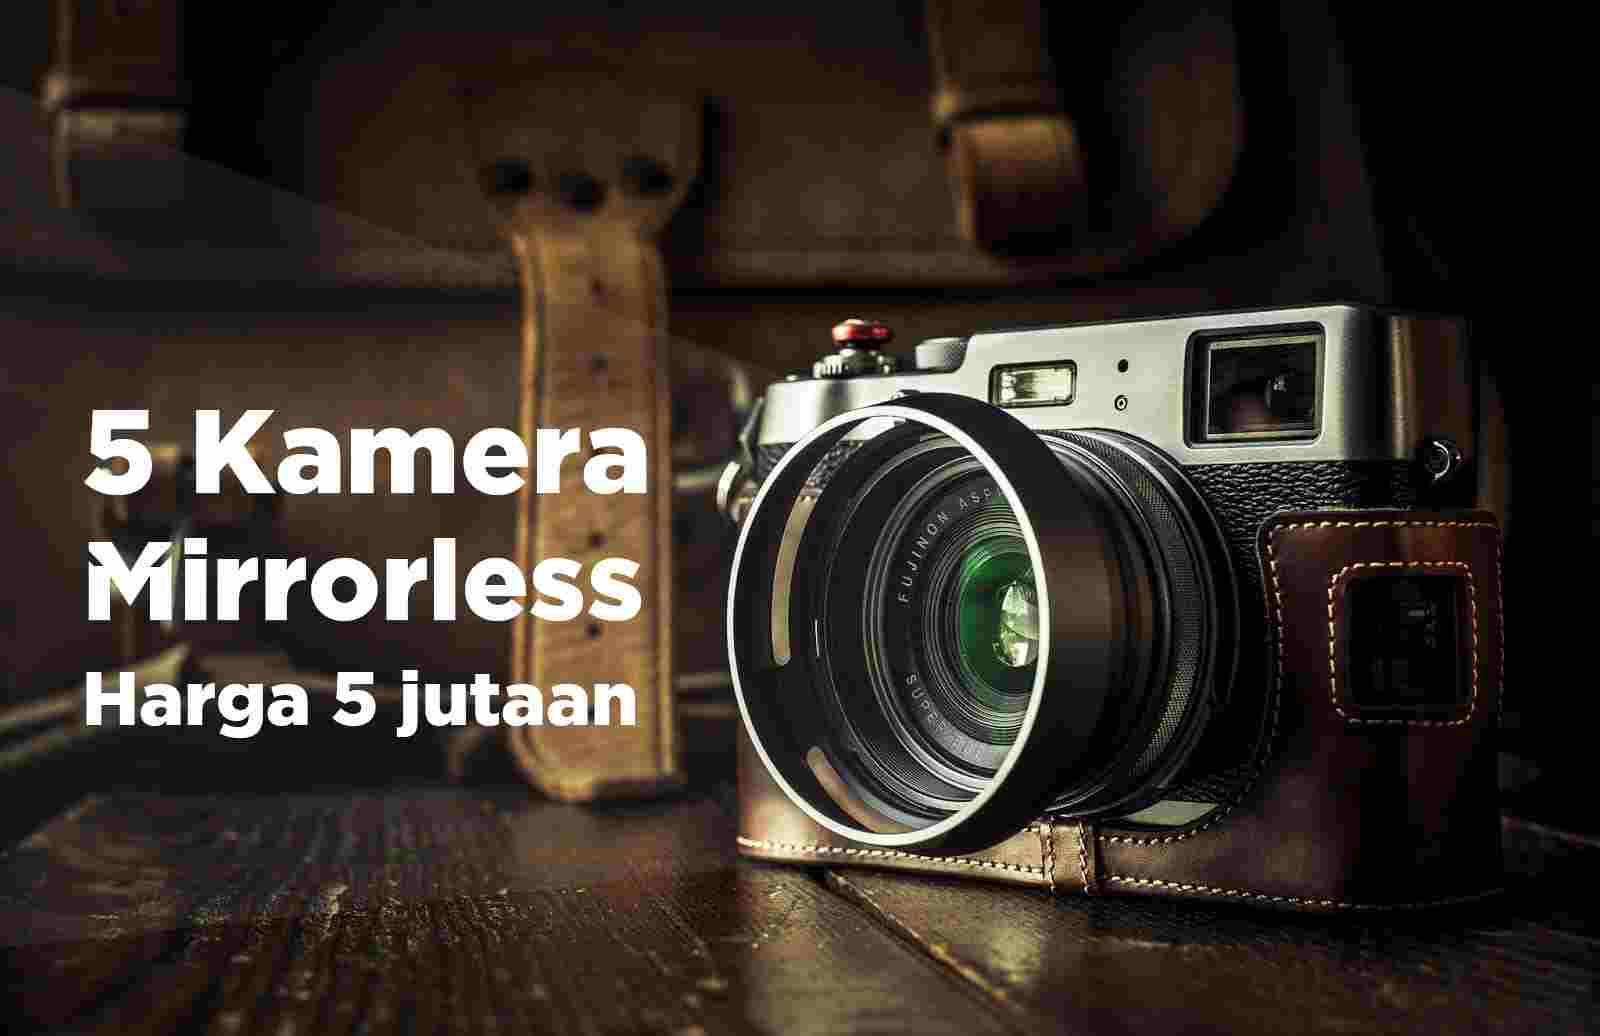 5 Kamera Mirorrless Harga 5 Jutaan cocok untuk Pemula Sumber Background : Blog Banten Kamera